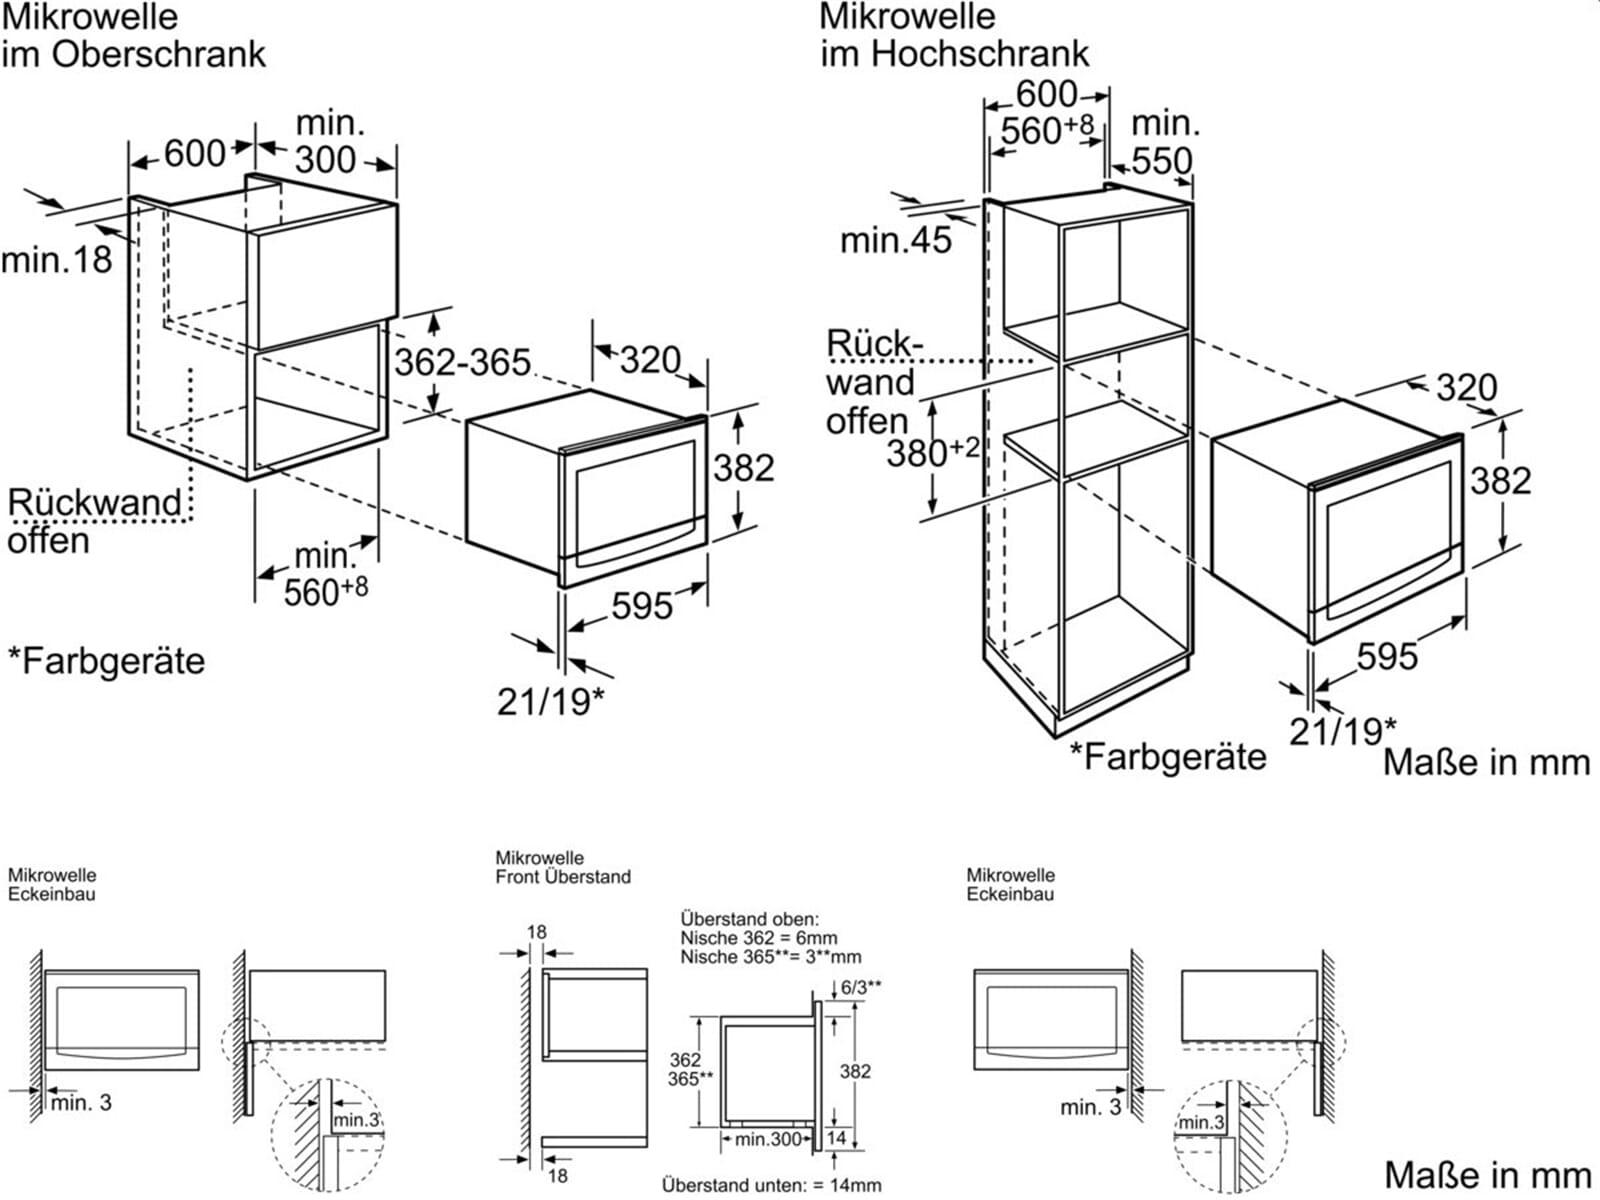 neff cr 5460 n einbau mikrowelle edelstahl mikrowellenherd 38cm integrierbar ebay. Black Bedroom Furniture Sets. Home Design Ideas